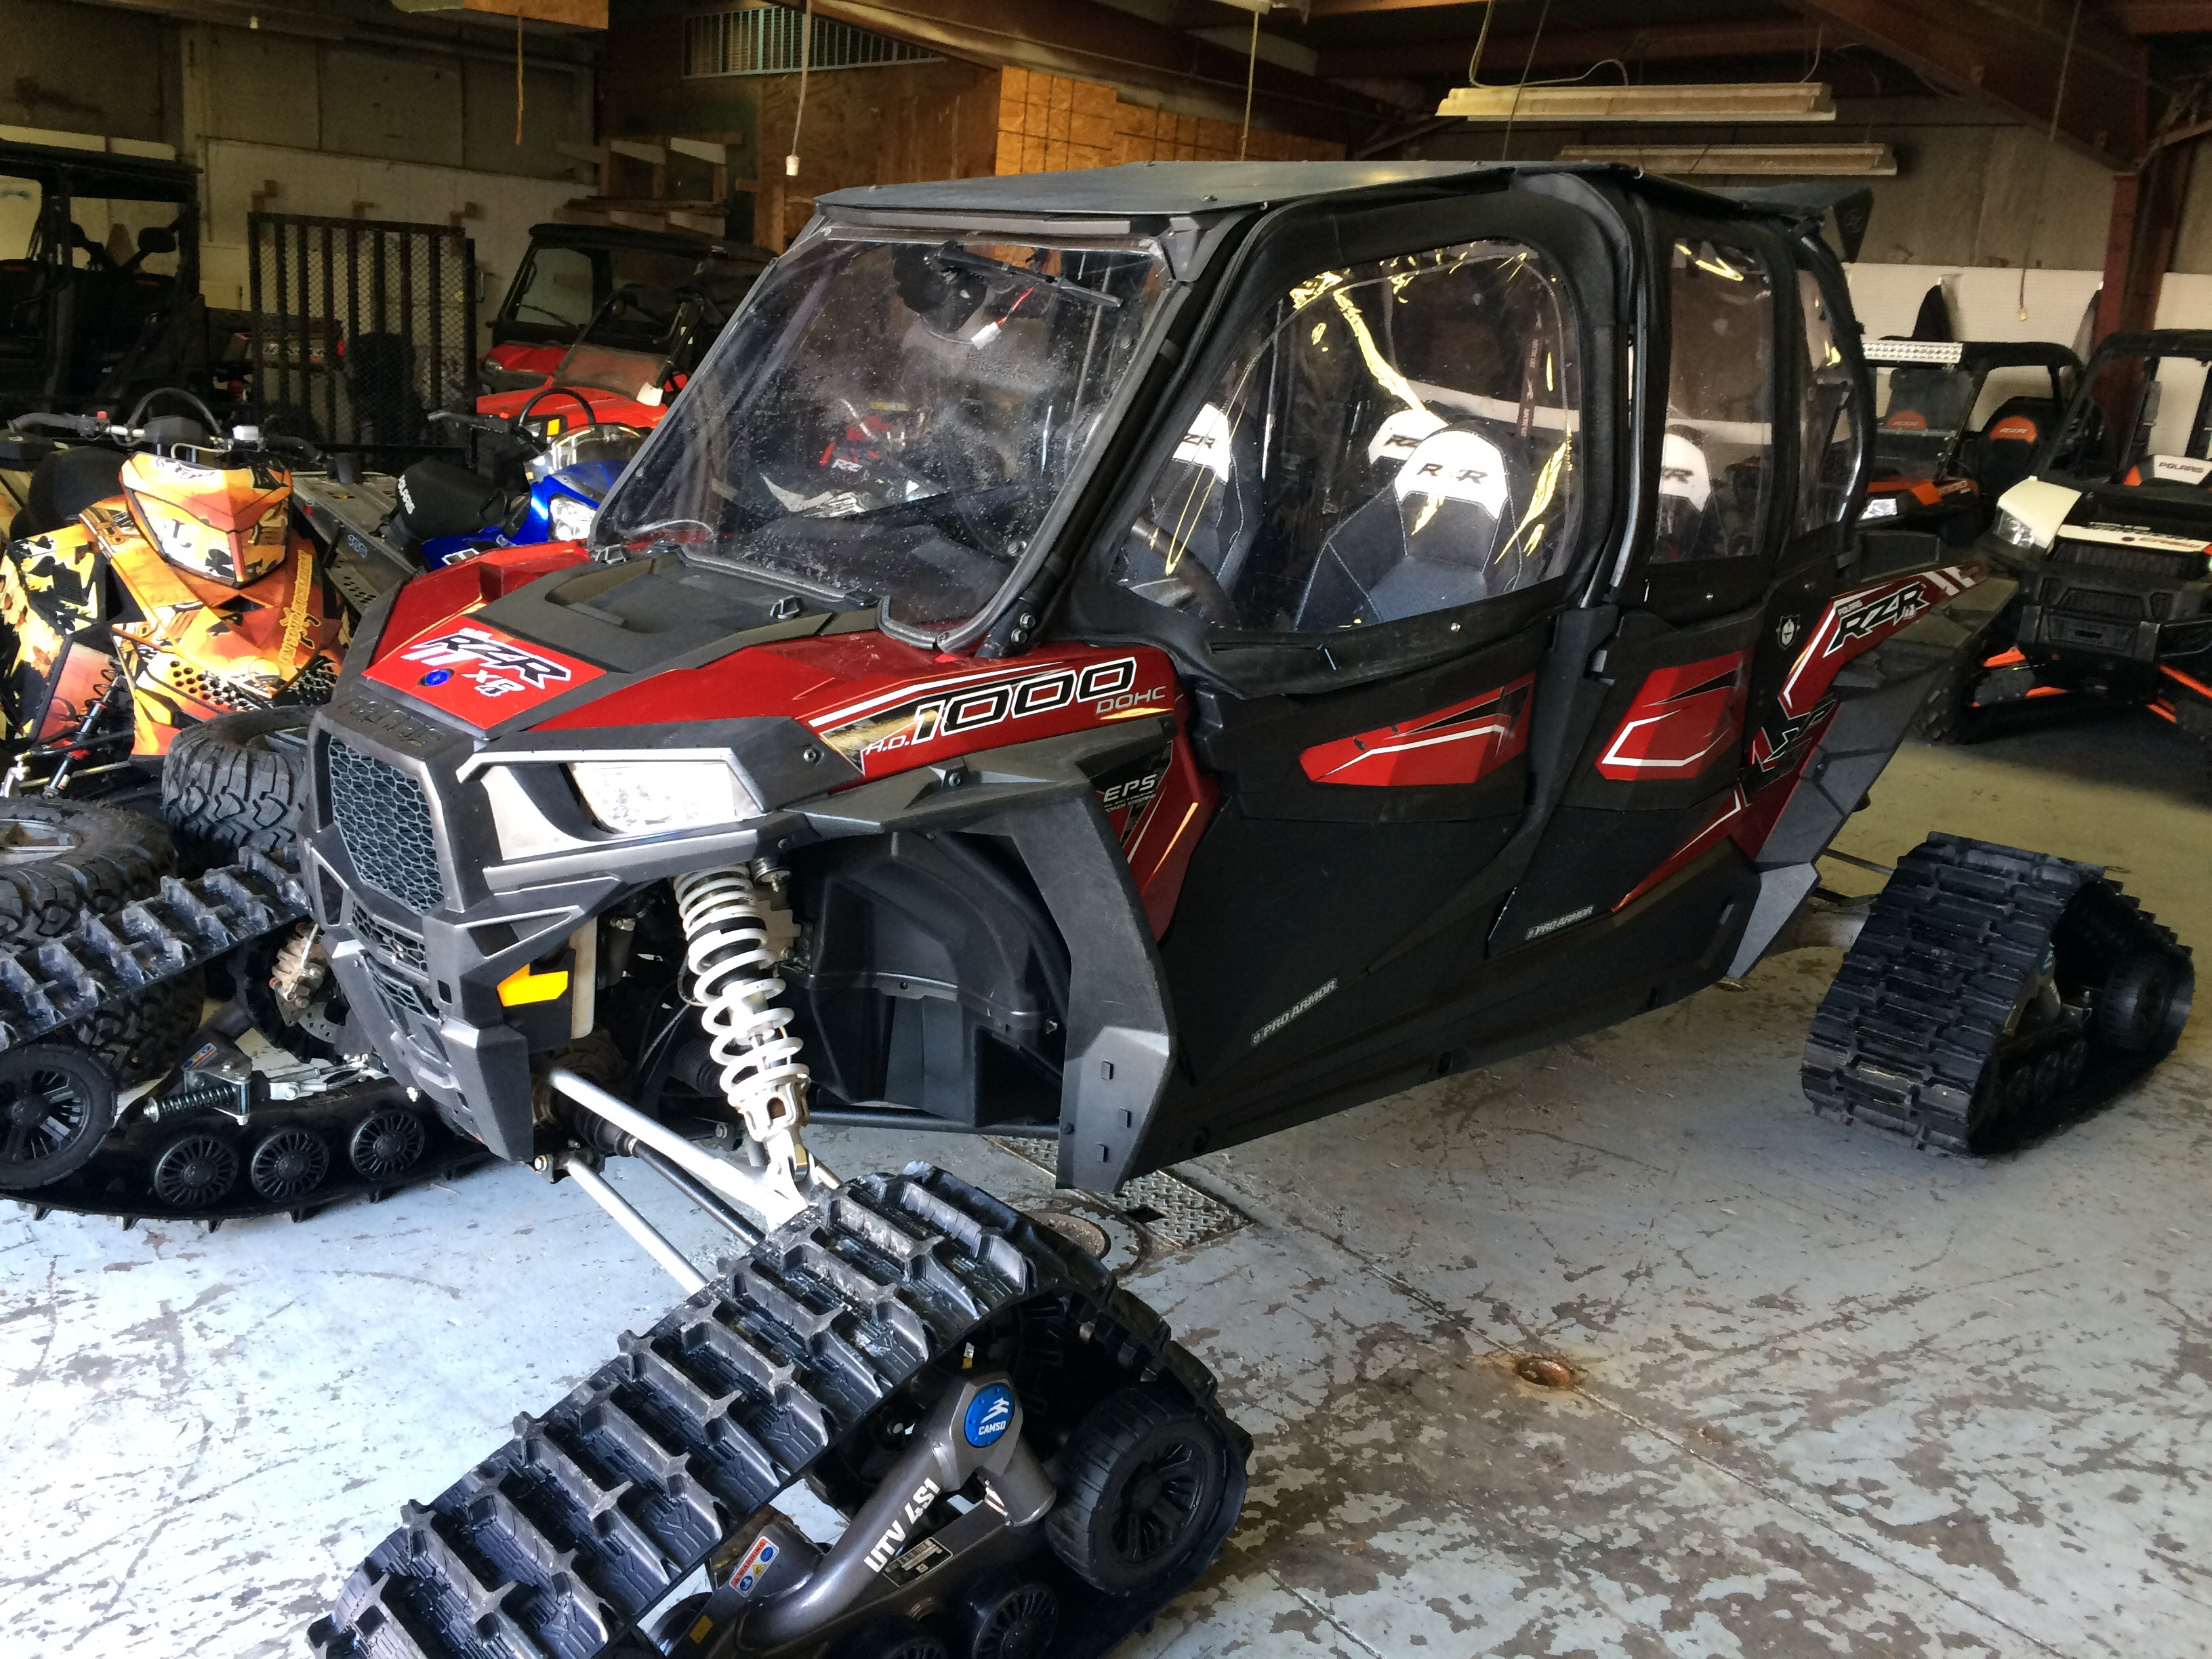 2016 Polaris Rzr 1000 Xp 4 Seater With Tracks 20 600 Sold All Terrain Sports Bountiful Utah